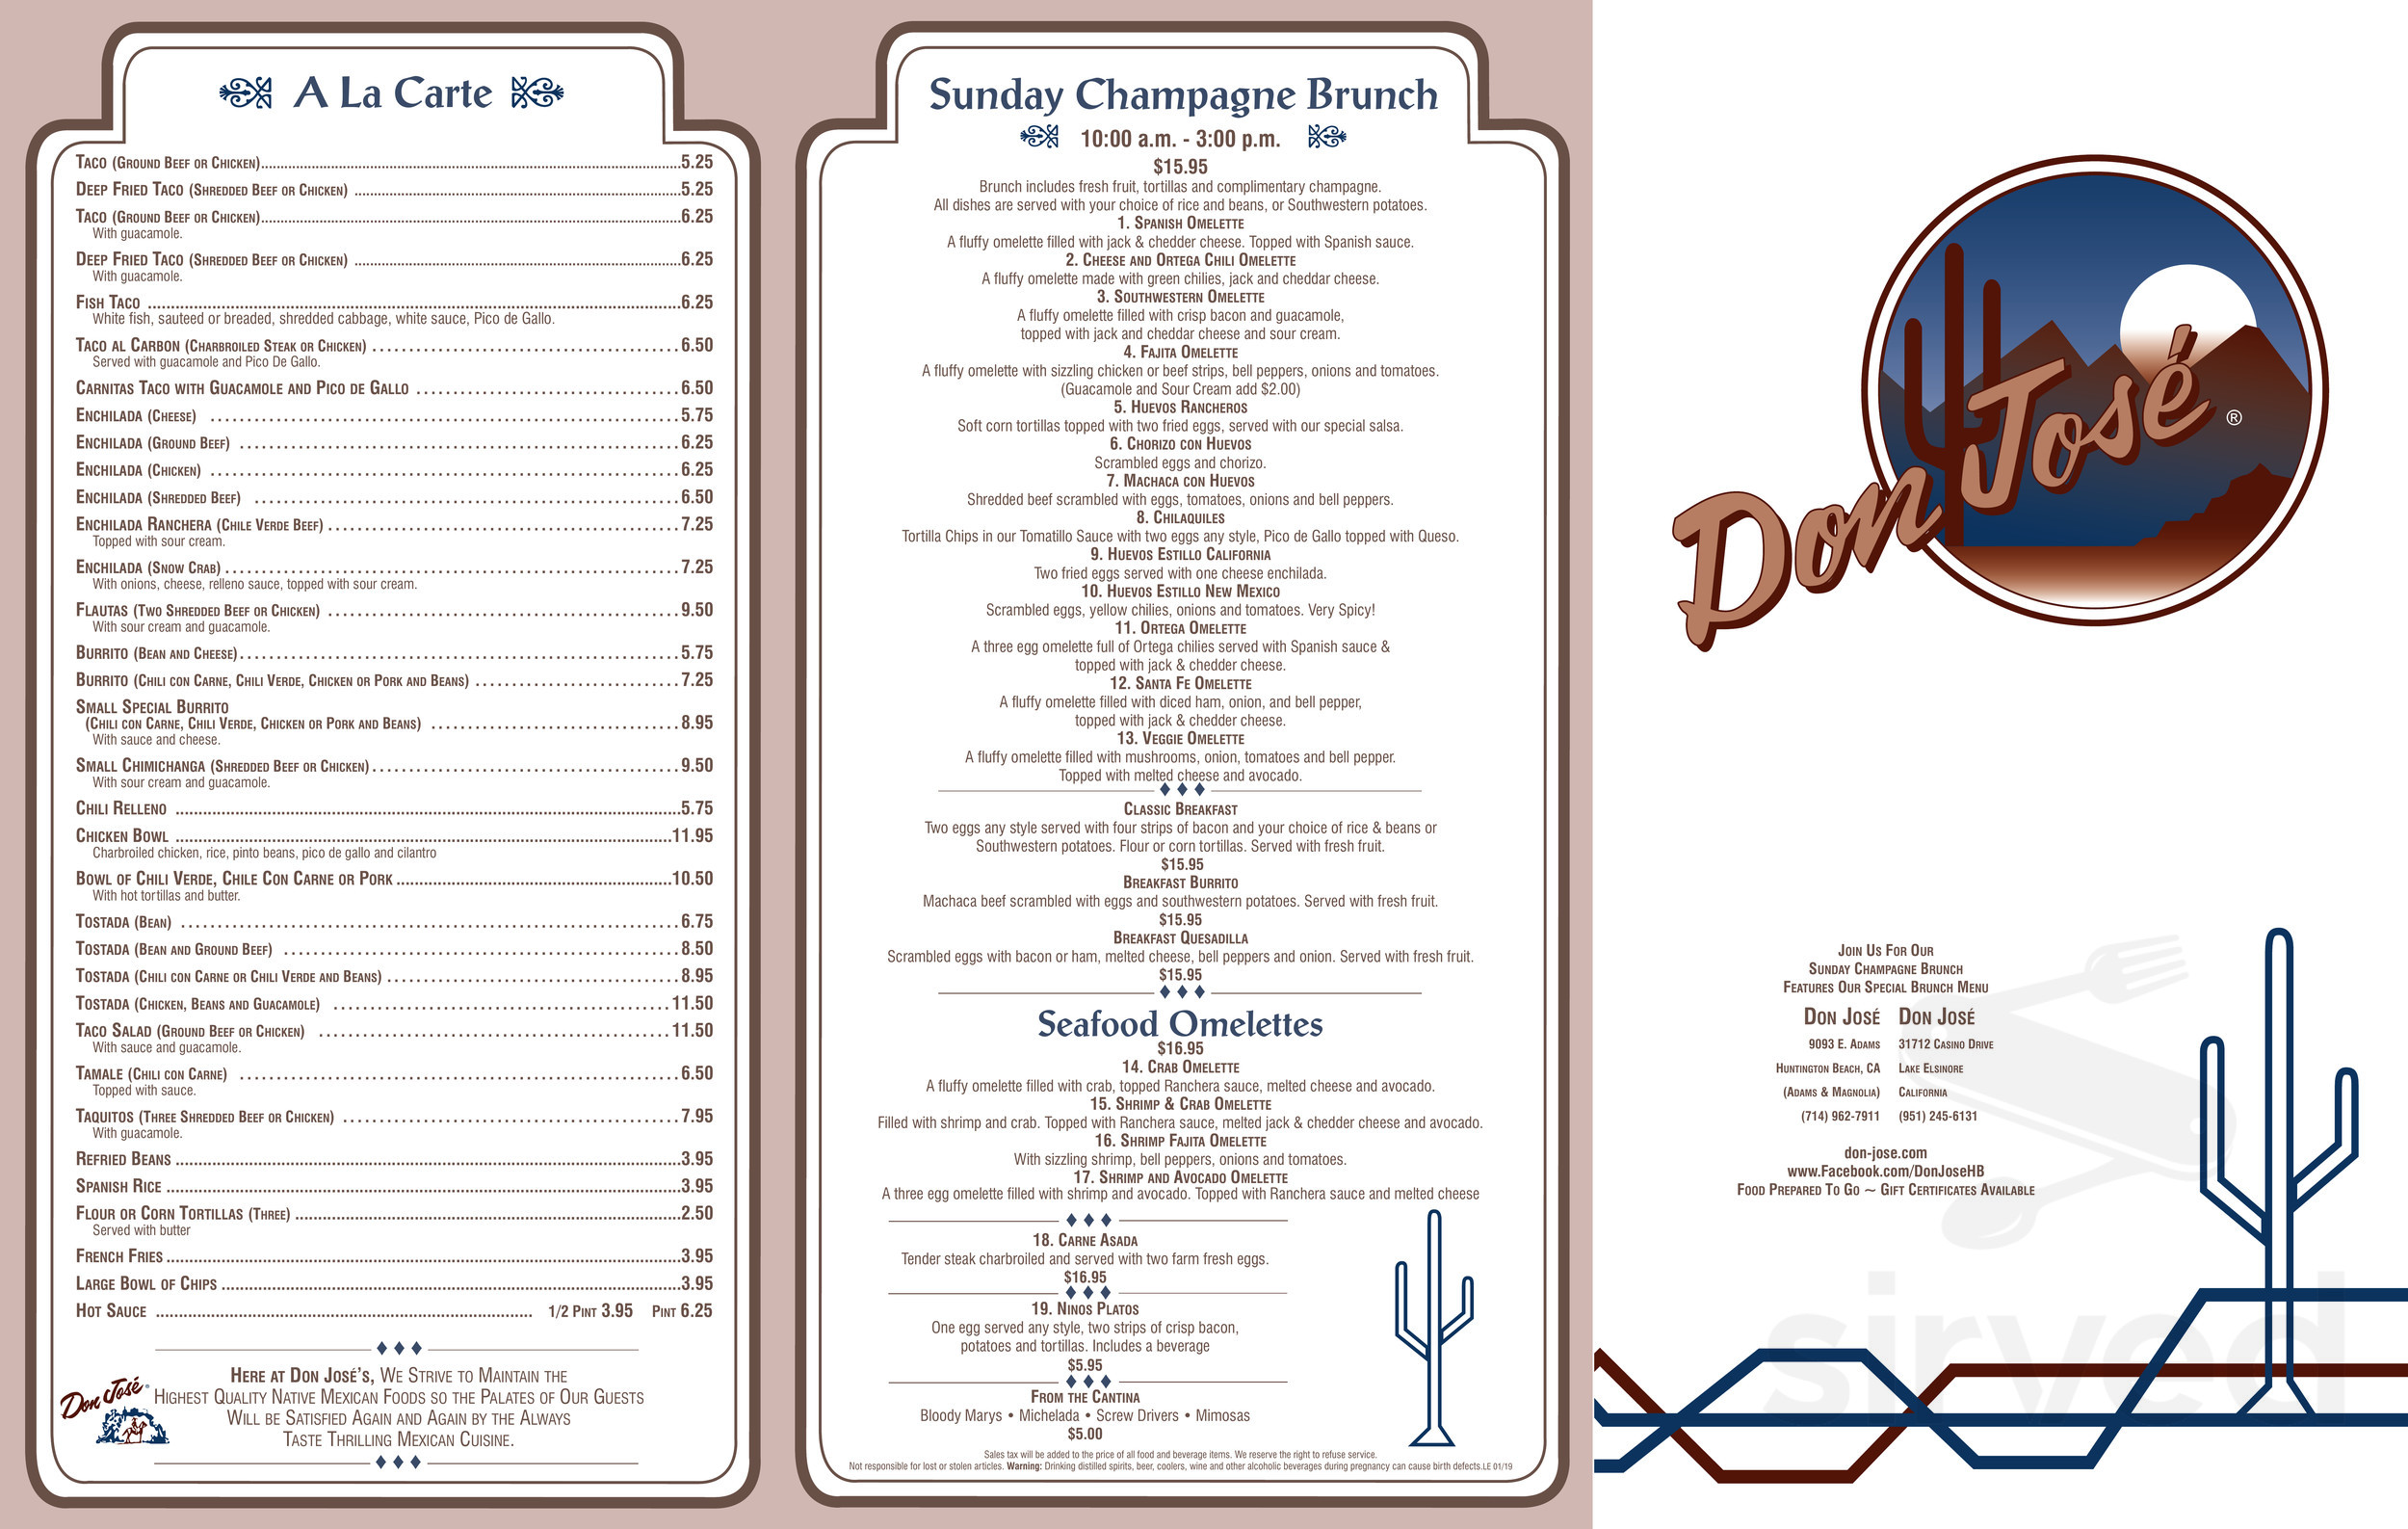 Menu For Don Jose Mexican Restaurant In Lake Elsinore